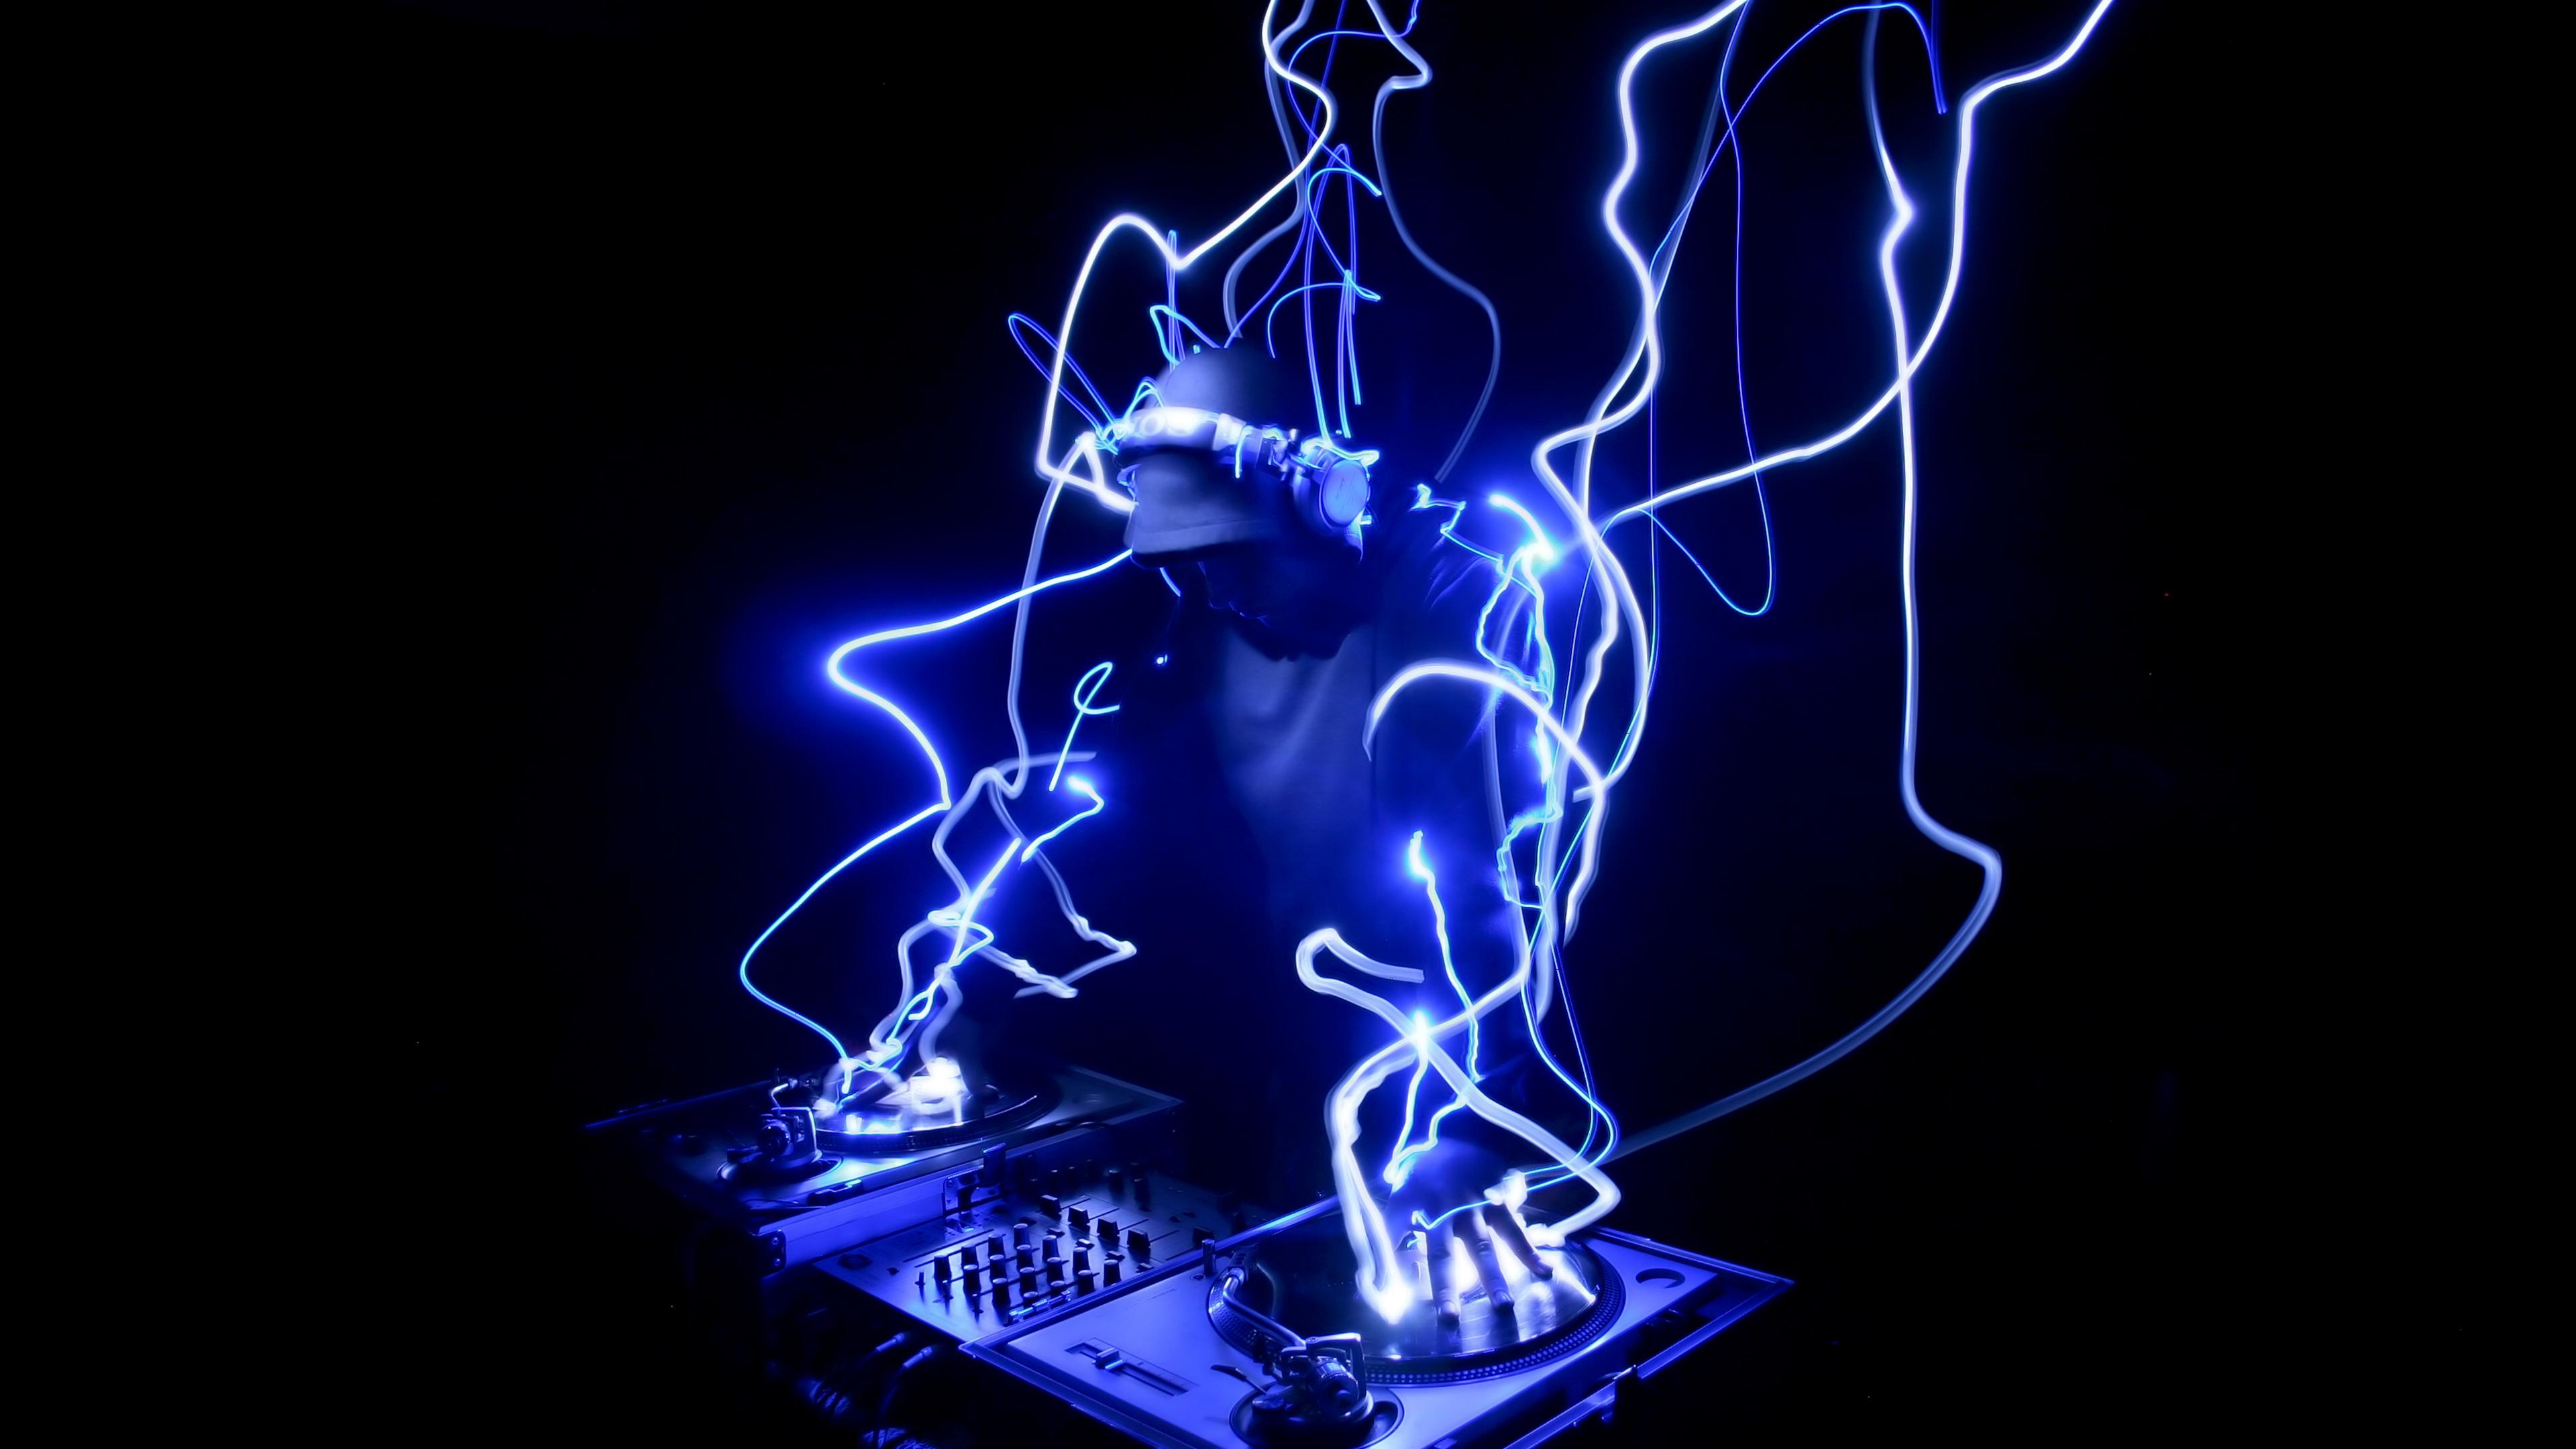 Dj 4k Wallpaper Electronic Music Dark Black Background Amoled Black Dark 1943